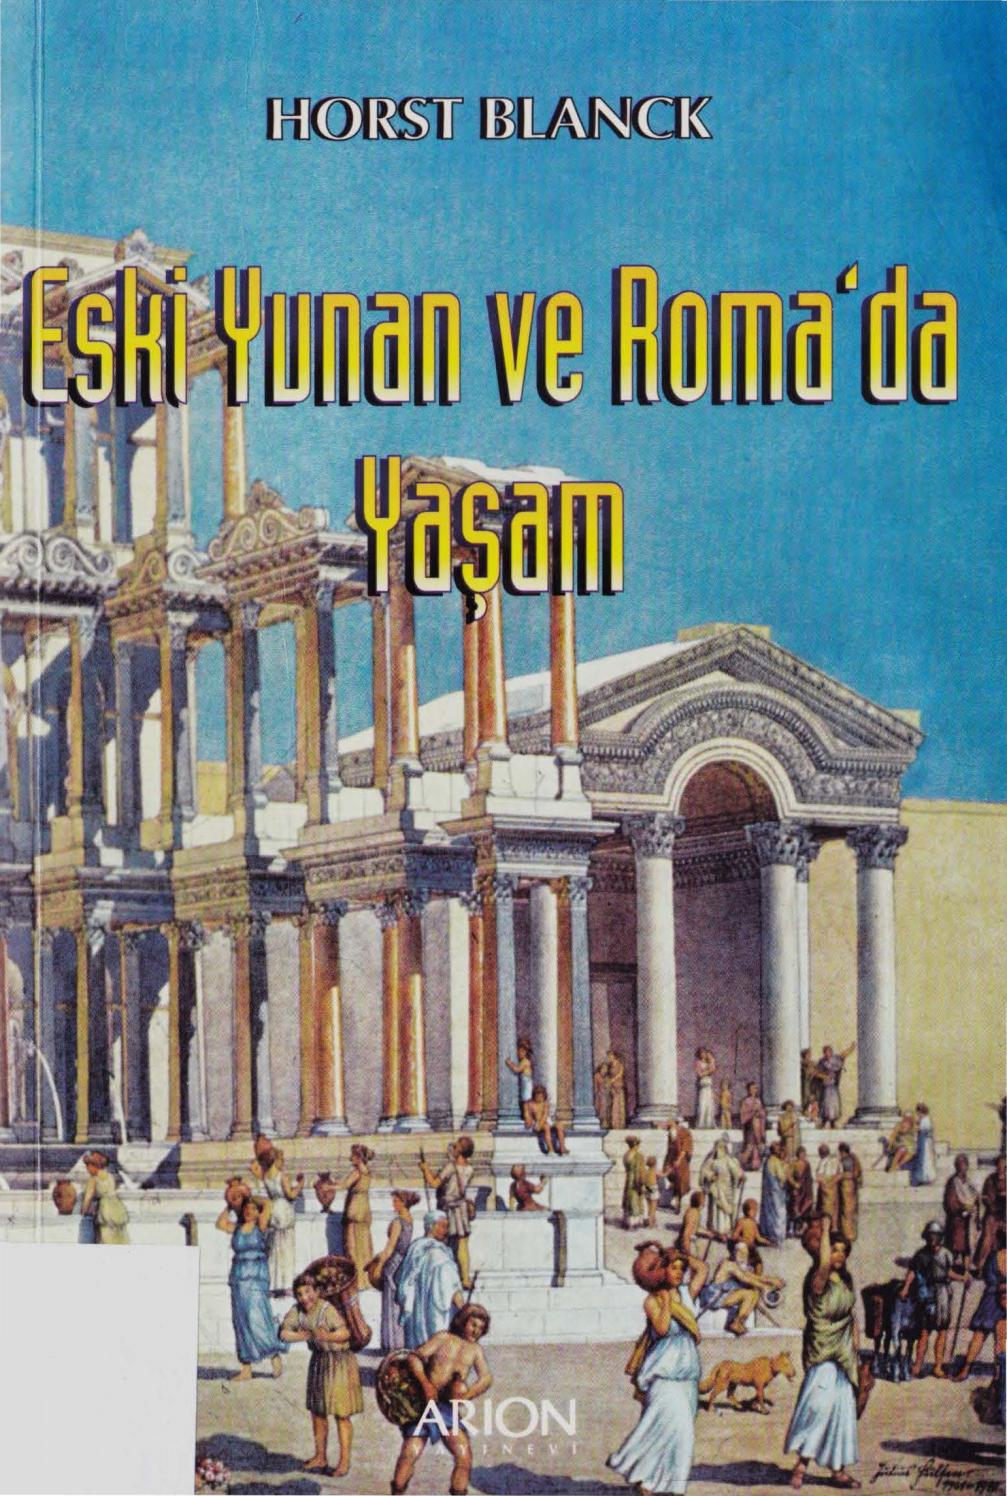 Horst Blanck- Eski Yunan Ve Roma'da Yaşam By Orbis - Issuu pour Amphore De Jardin